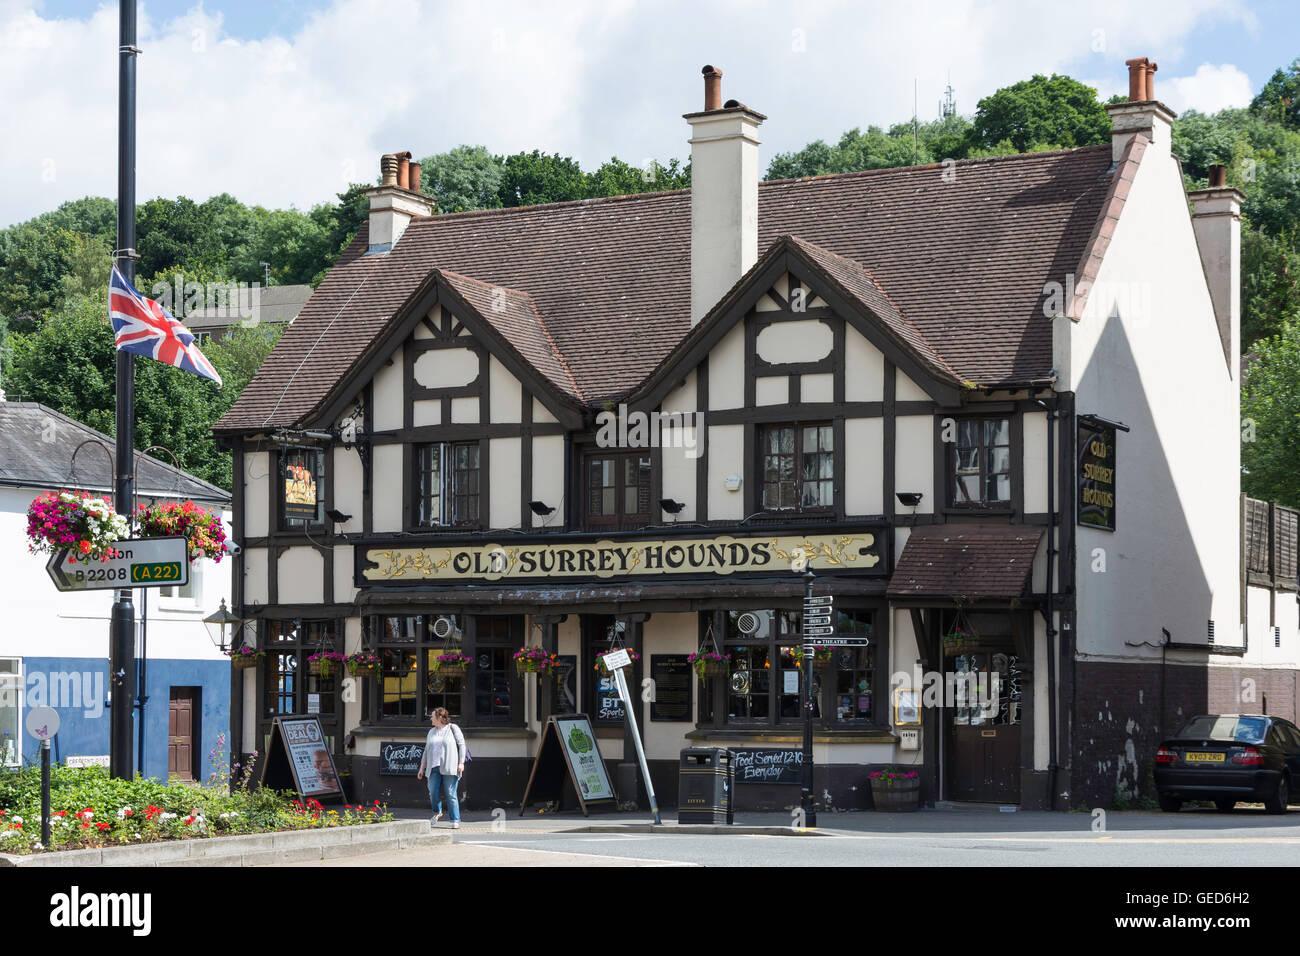 The Old Surrey Hounds Pub, The Square, Caterham, Surrey, England, United Kingdom - Stock Image